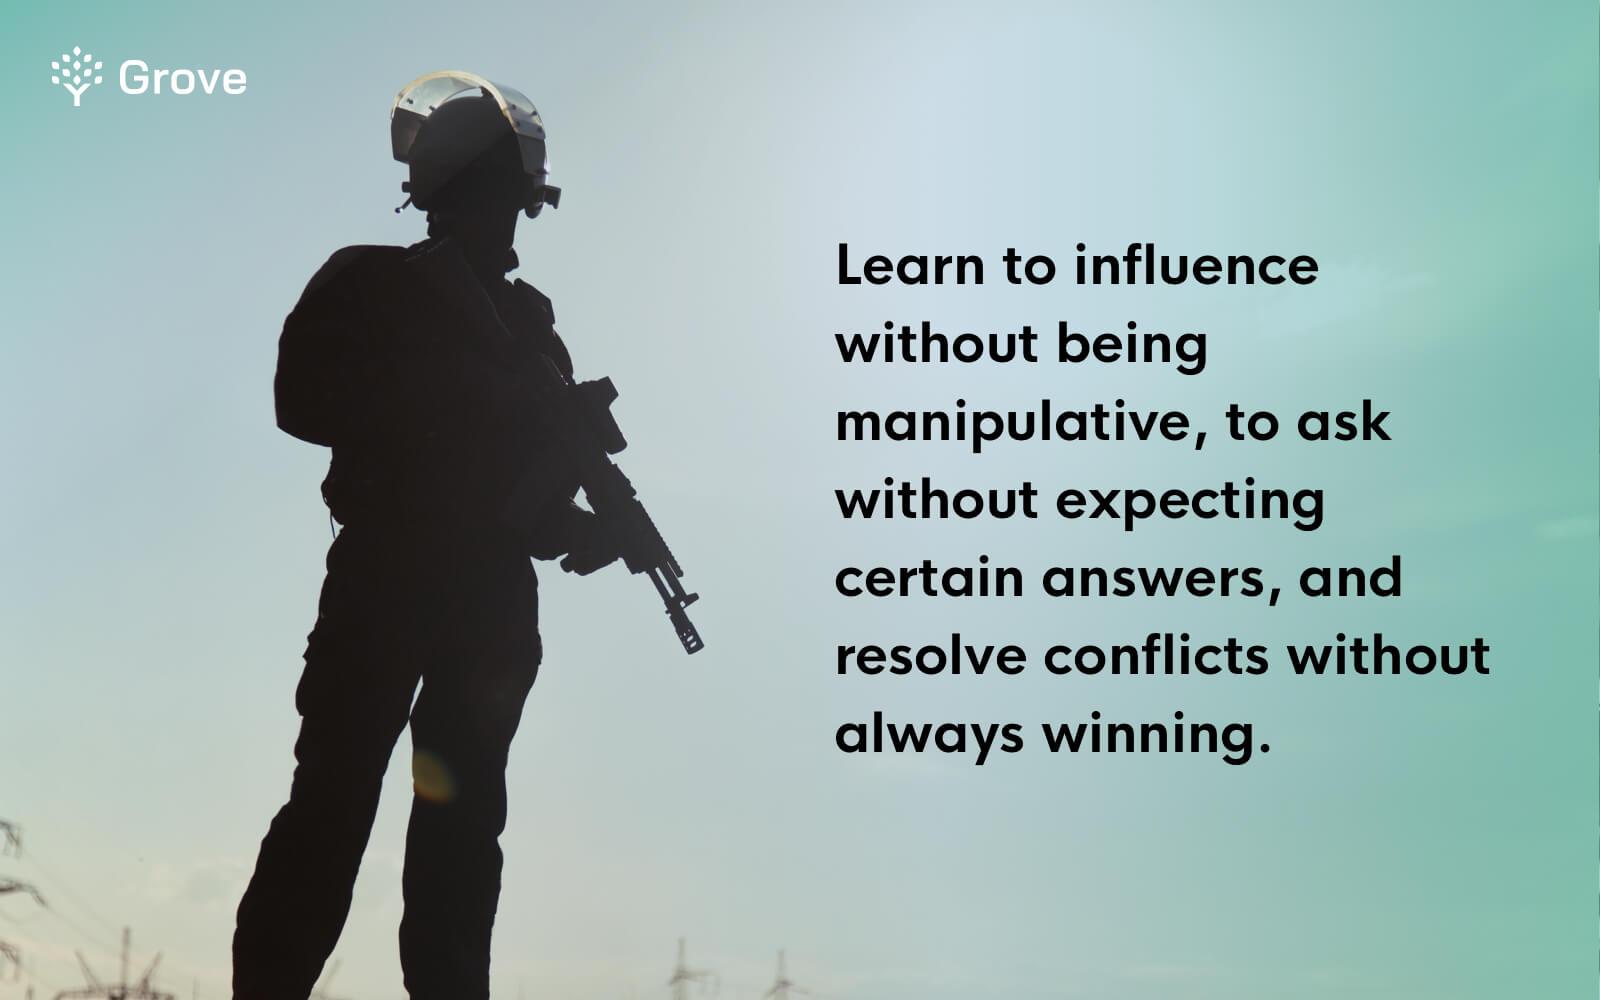 Grove HR - military leadership